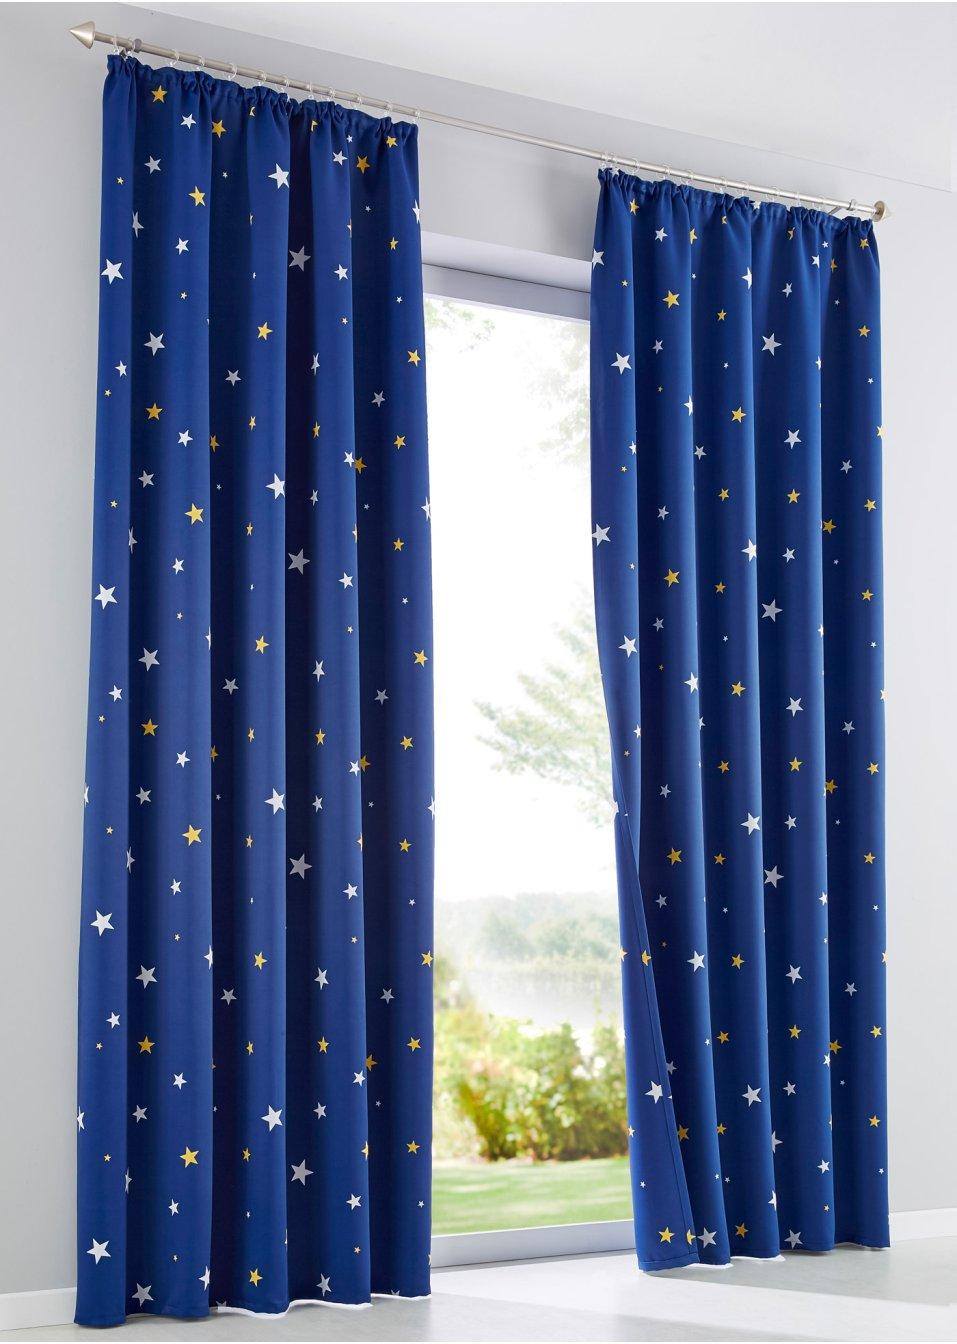 verdunkelungsvorhang beidseitig sterne 1er pack nachtblau wohnen. Black Bedroom Furniture Sets. Home Design Ideas